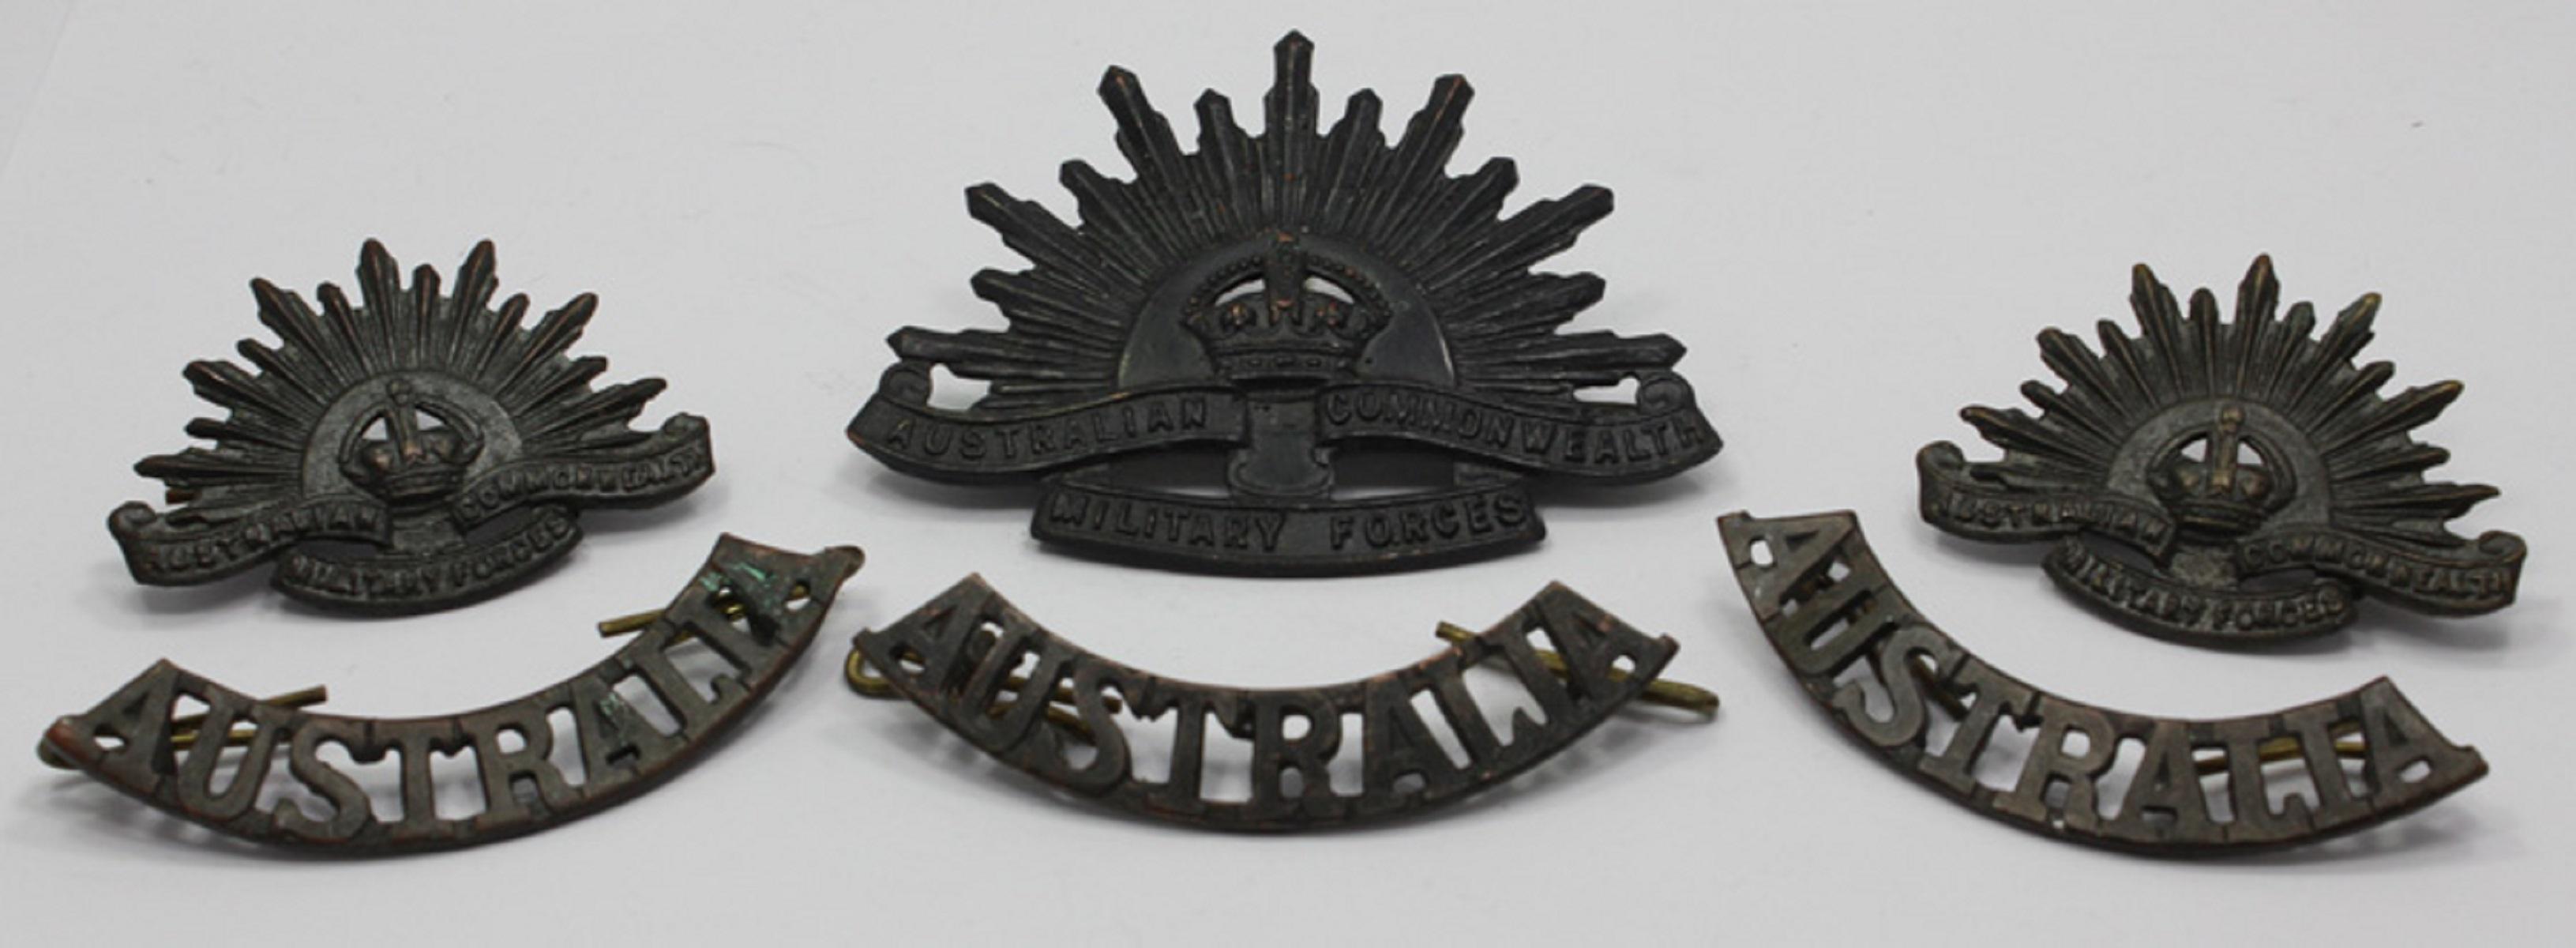 Australia. 'Rising Sun' - Large (1), Small (2) & 'AUSTRALIA' Shoulder Badges (3)(6 items in total)